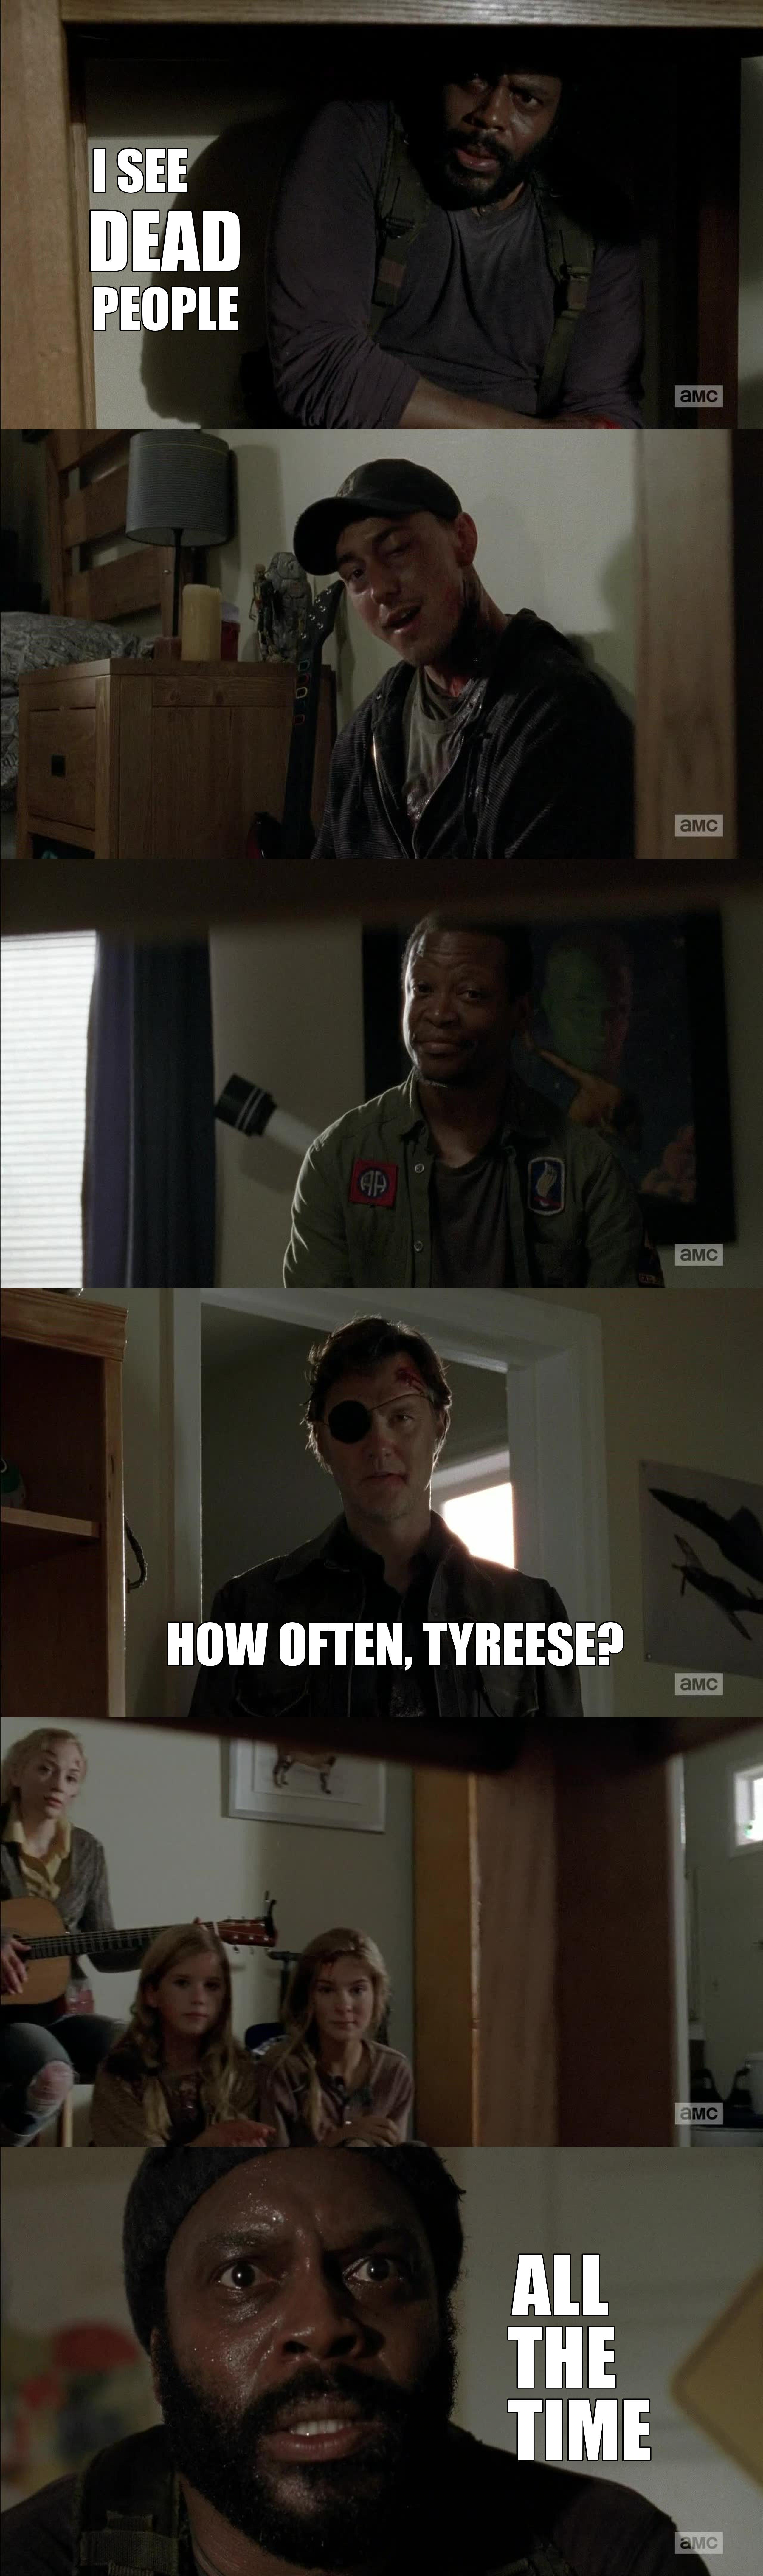 Reaching the sixth sense, Tyreese?